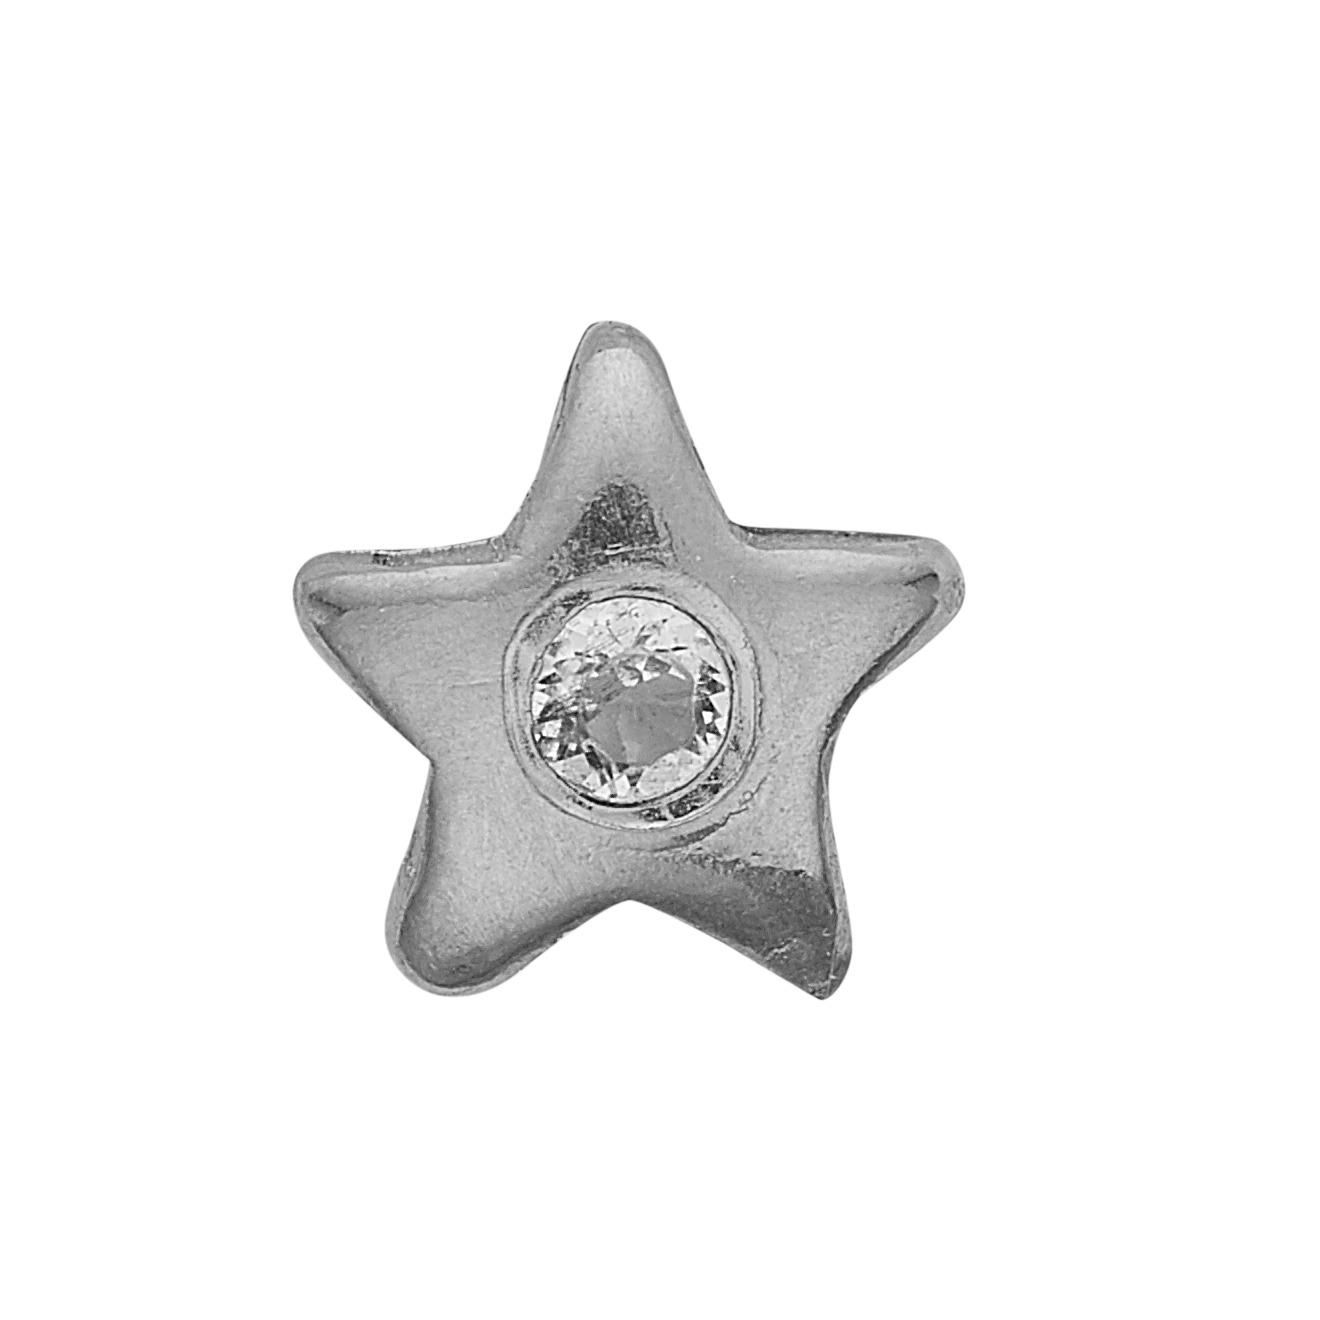 christina watches – Christina collect topaz star - 603-s5 fra brodersen + kobborg